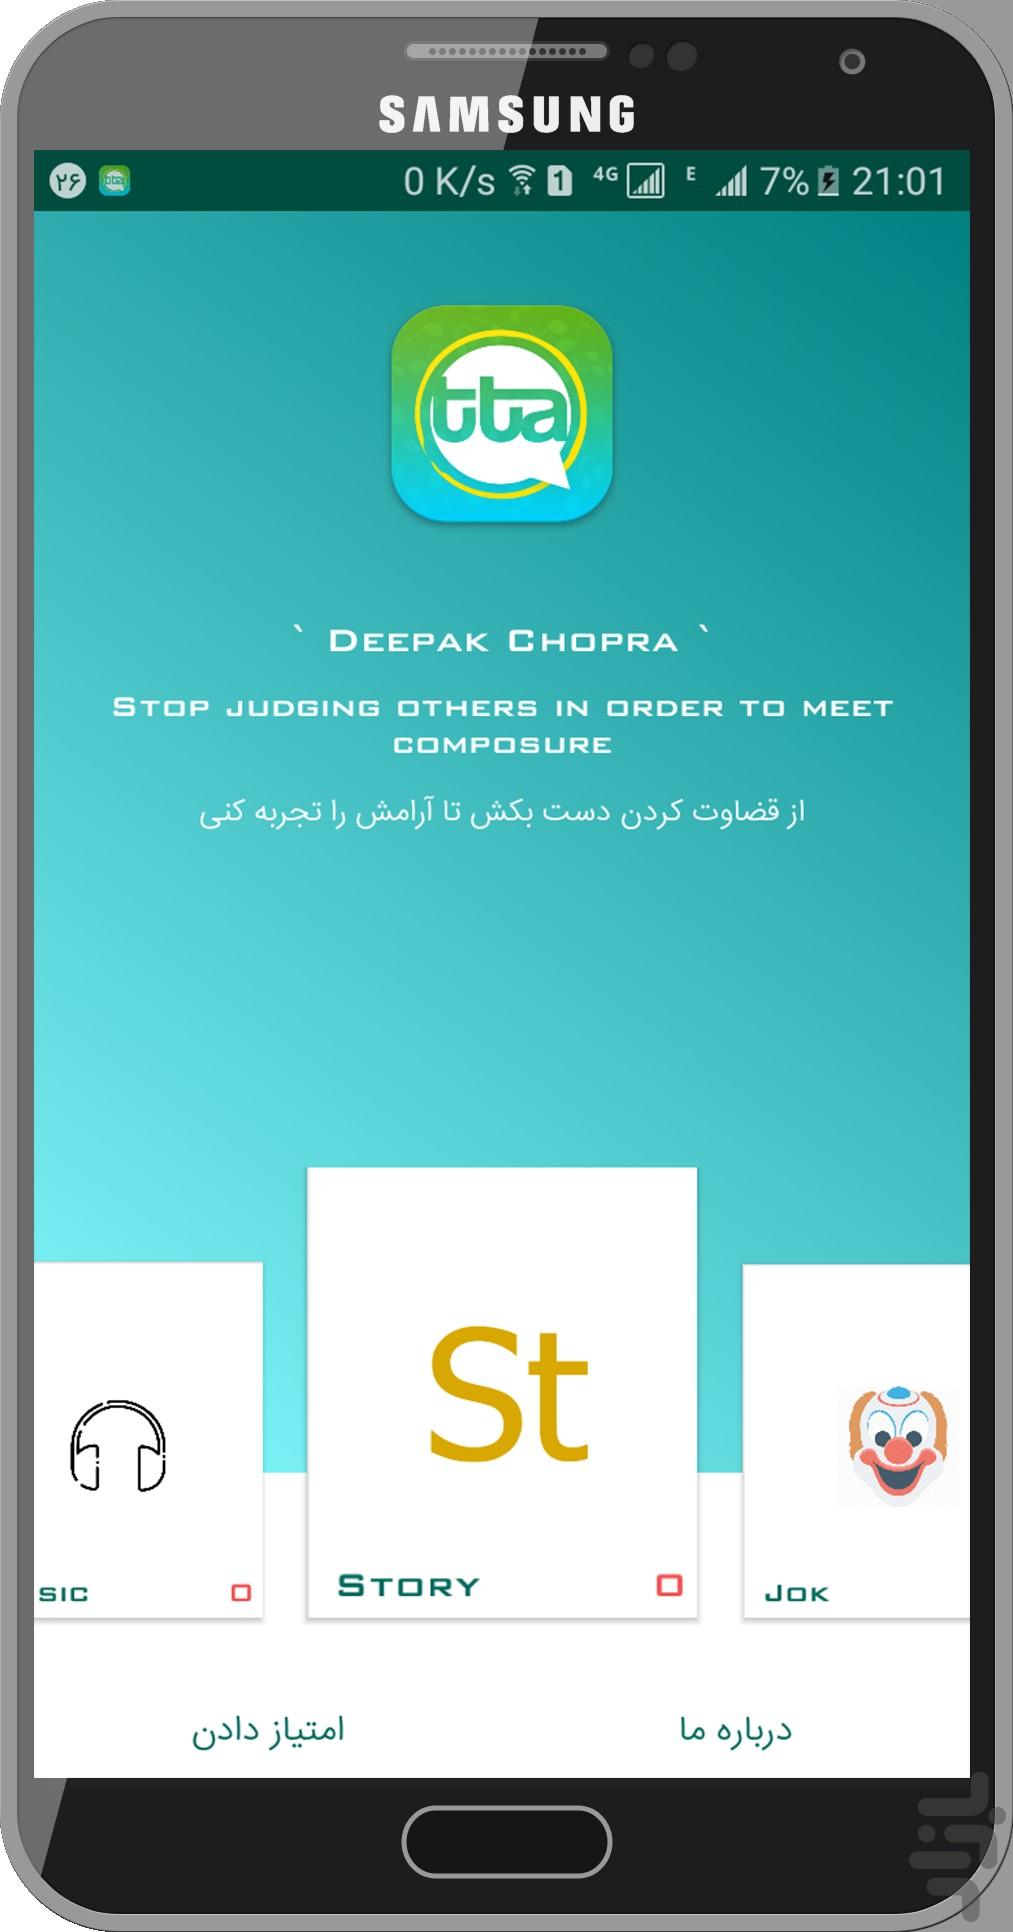 Tip Top App for Android - Download | Cafe Bazaar